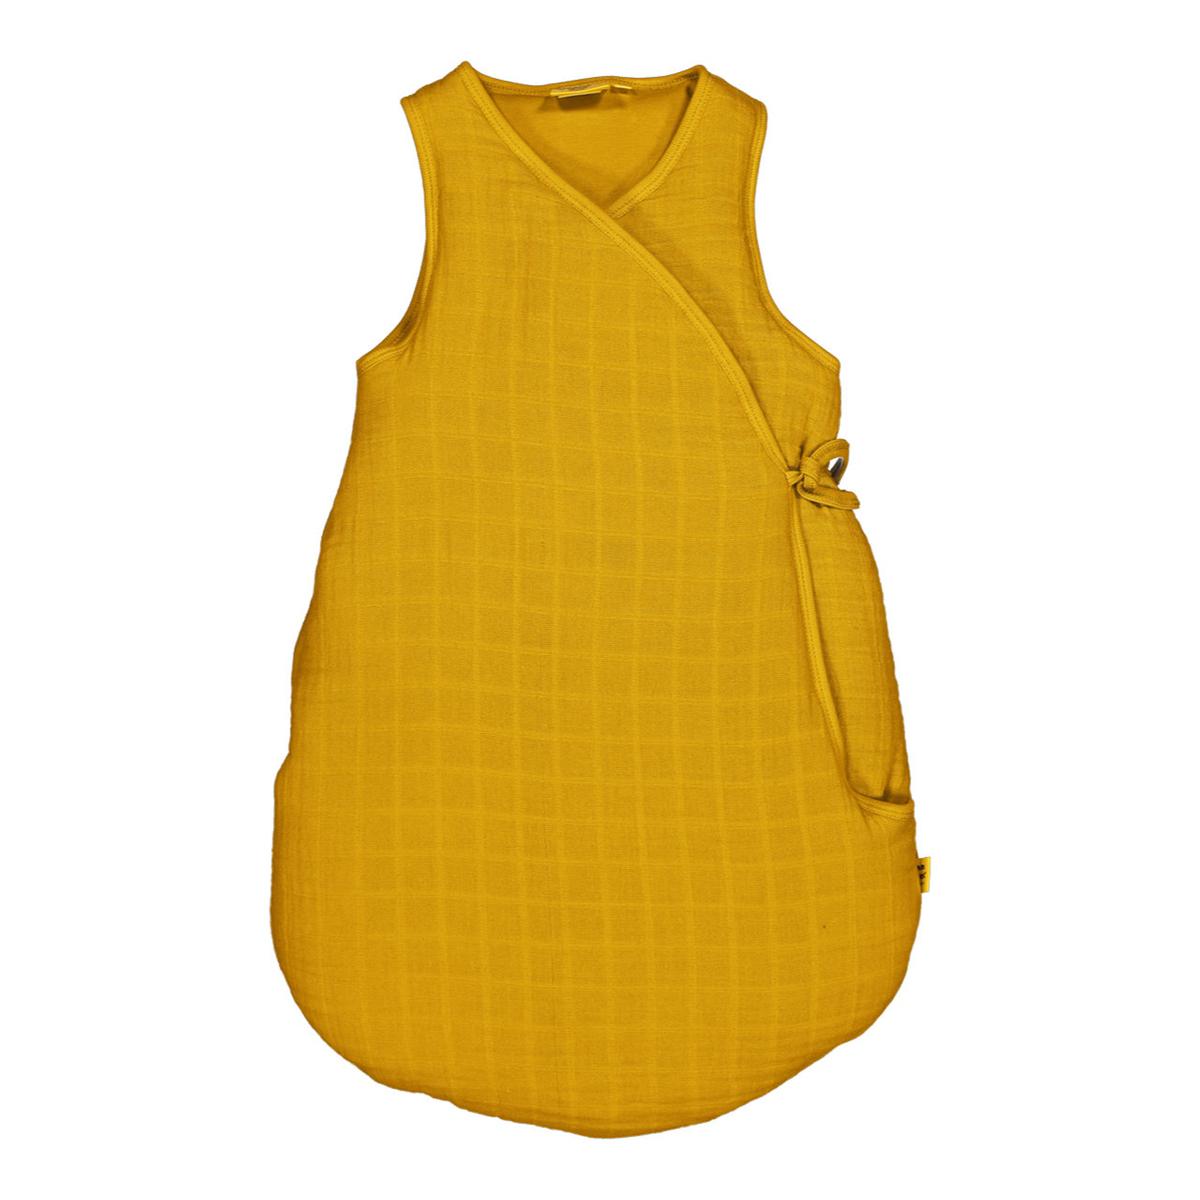 Gigoteuse Gigoteuse Sleepy Mustard - 0/6 Mois Gigoteuse Sleepy Mustard - 0/6 Mois